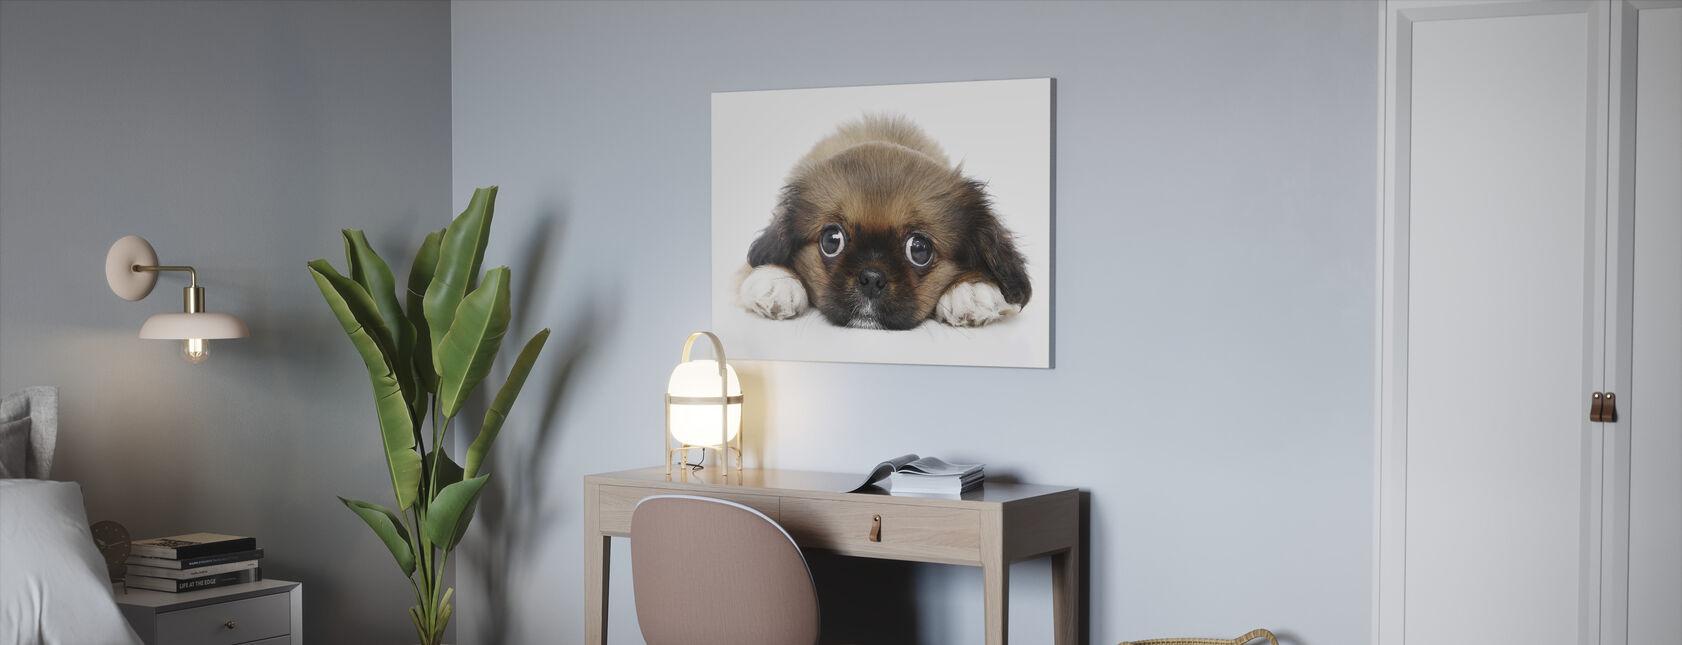 Store øyne - Lerretsbilde - Kontor